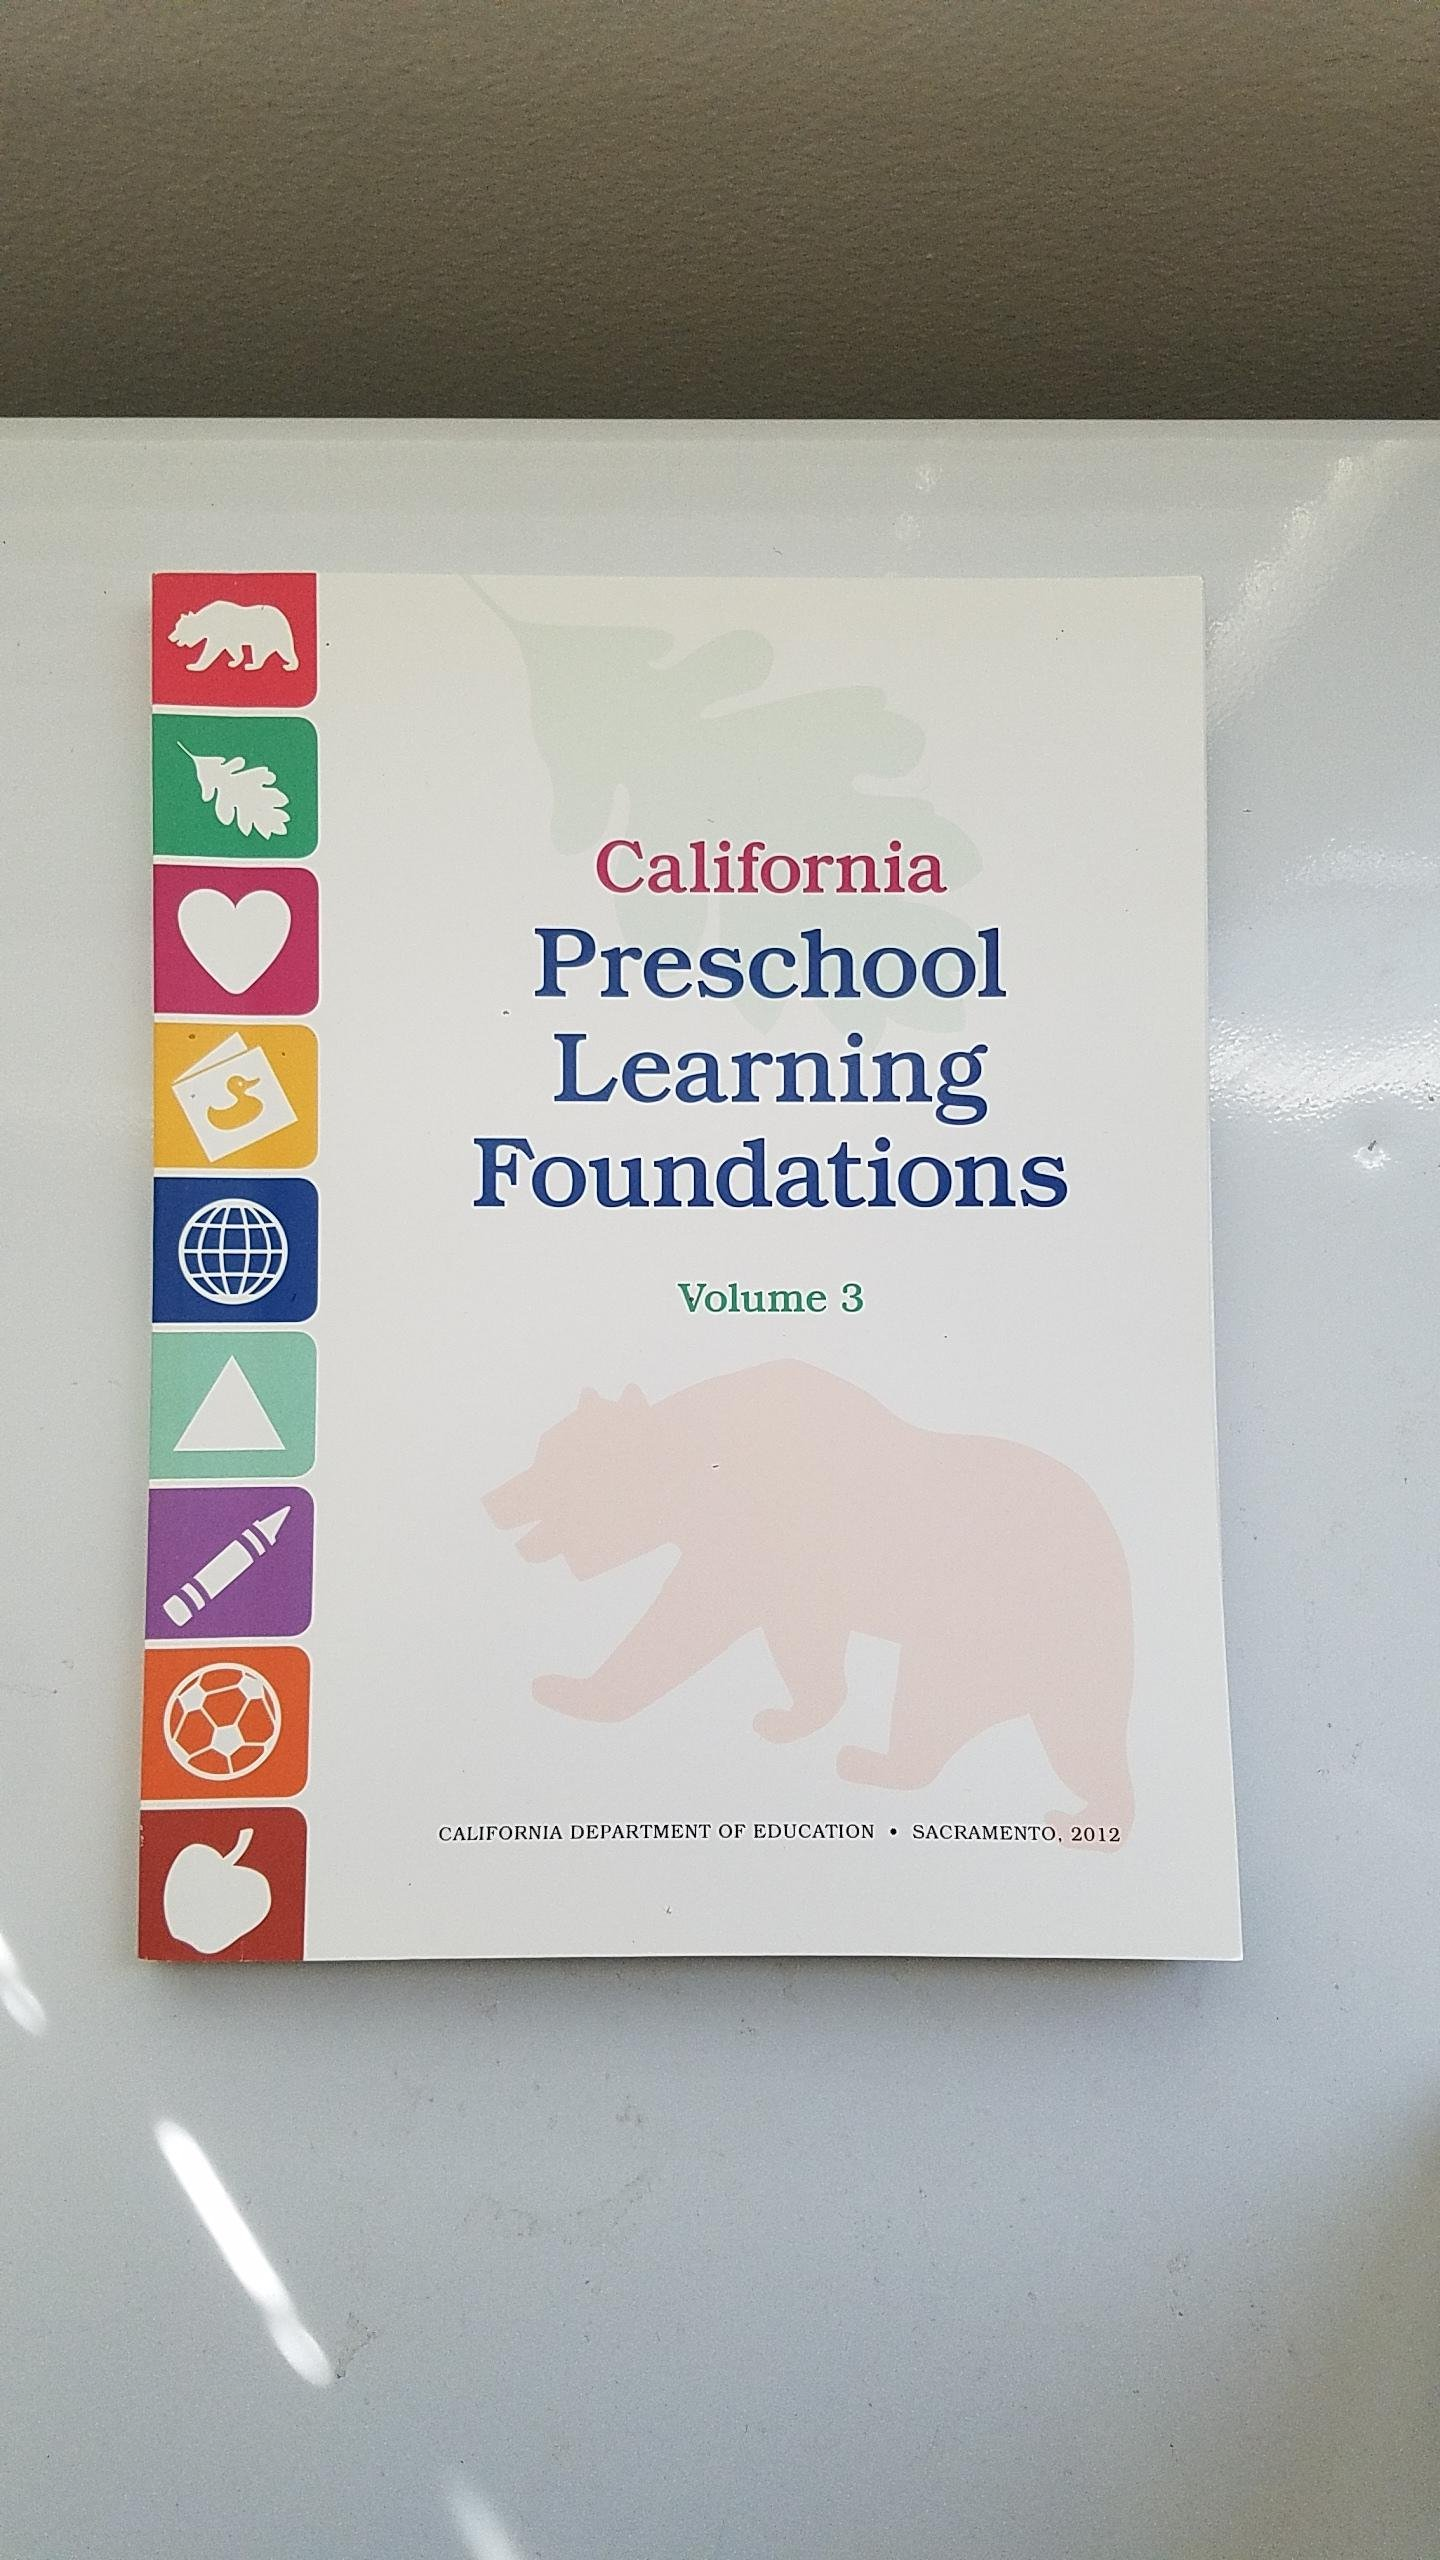 California preschool learning foundations volume 3 9780801117275 california preschool learning foundations volume 3 9780801117275 amazon books fandeluxe Choice Image